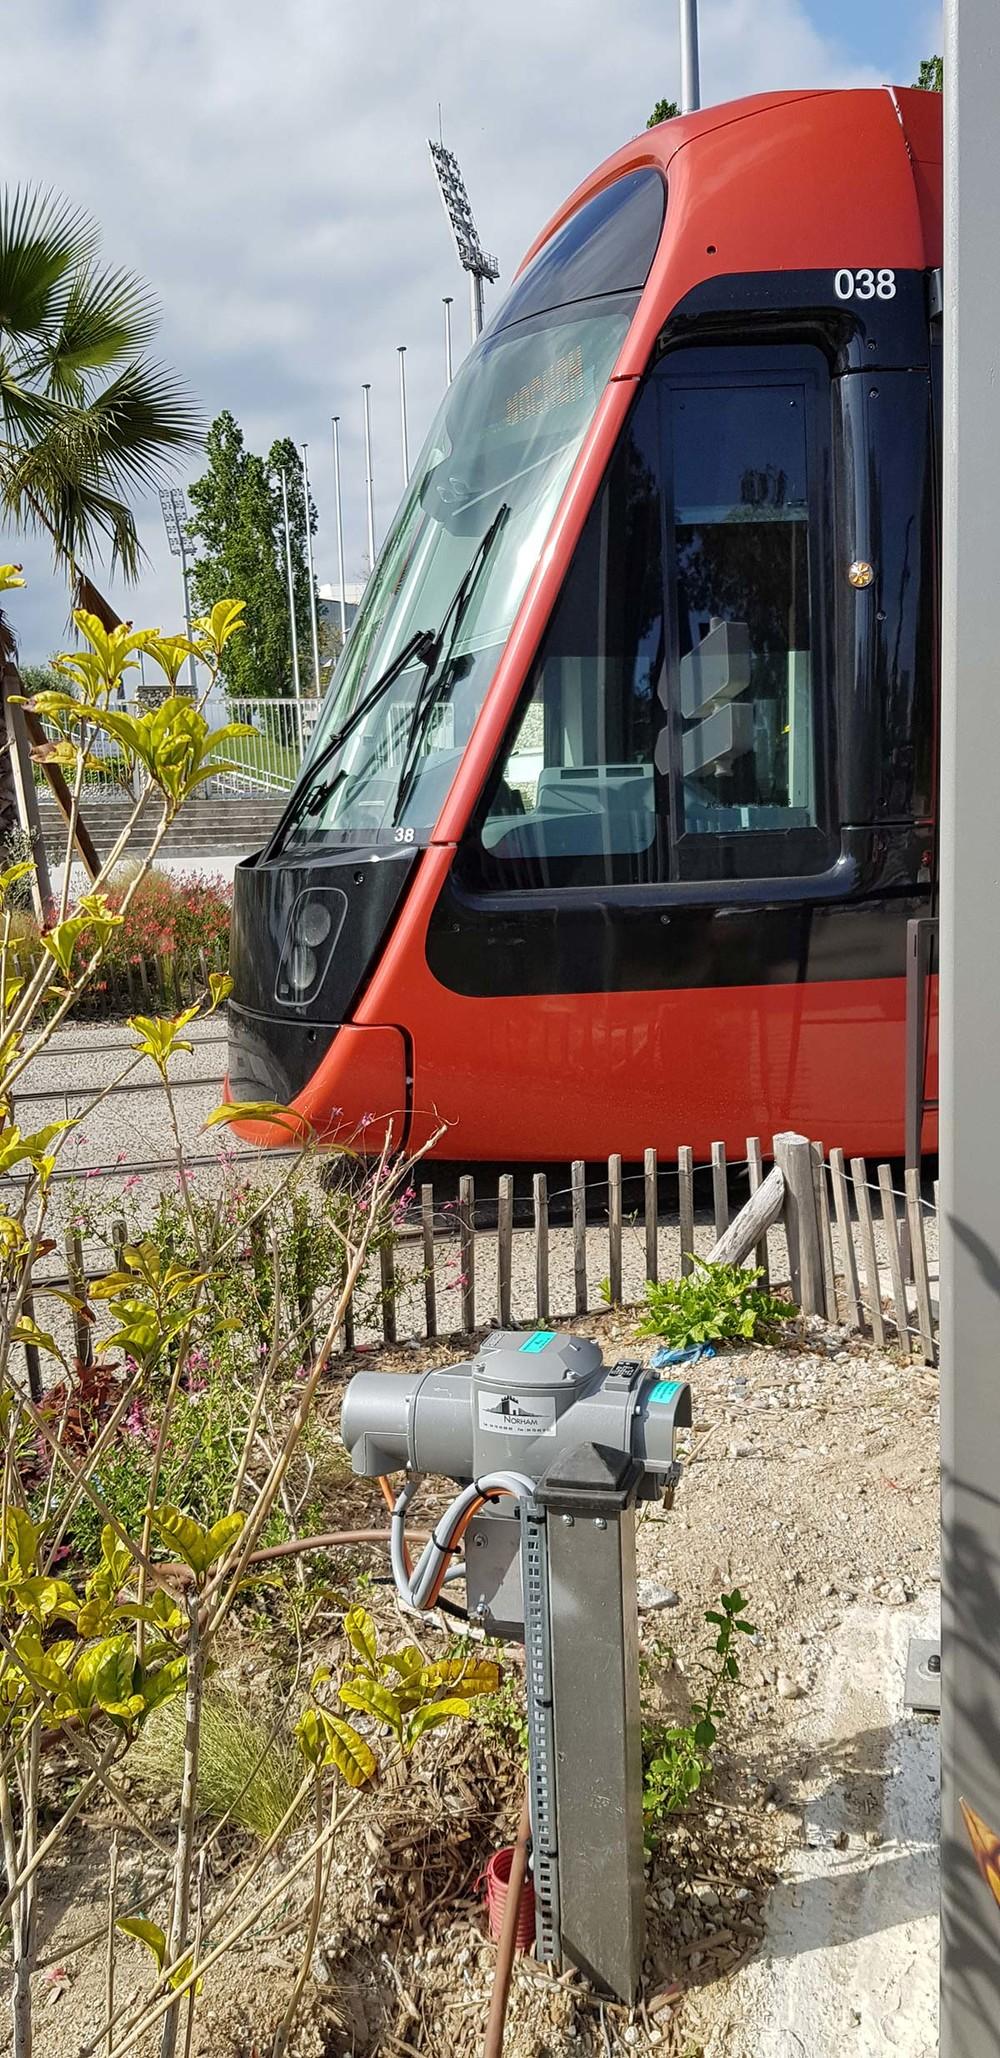 norham-photo-chantiers-servomoteur-SERVOFLEX-tram-nice.jpg